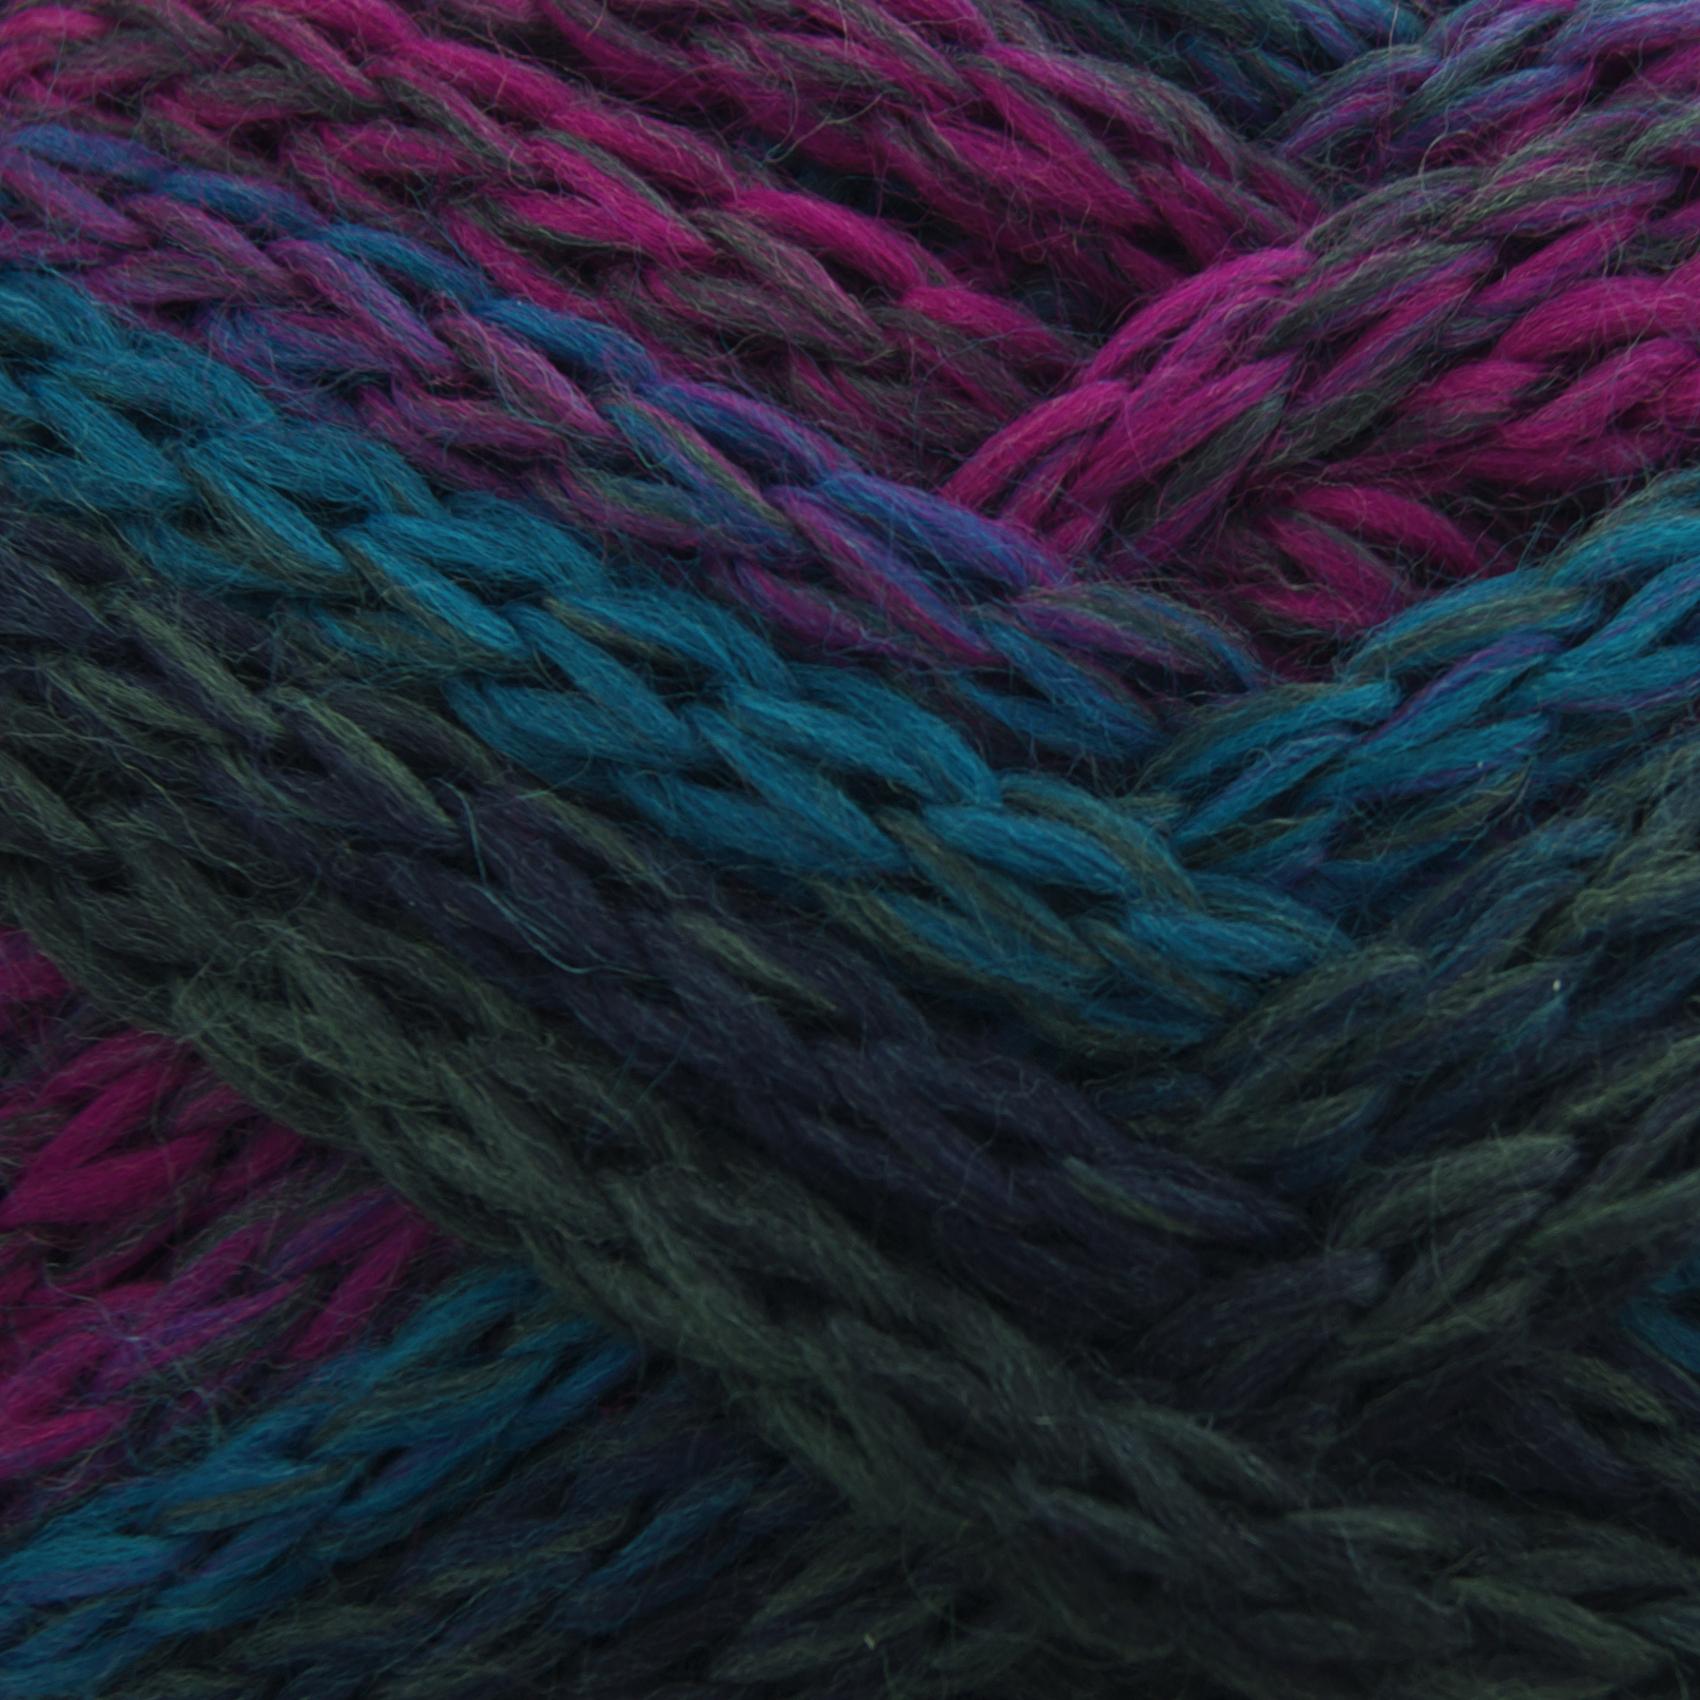 king cole ultimate super chunky knitting yarn soft knit. Black Bedroom Furniture Sets. Home Design Ideas